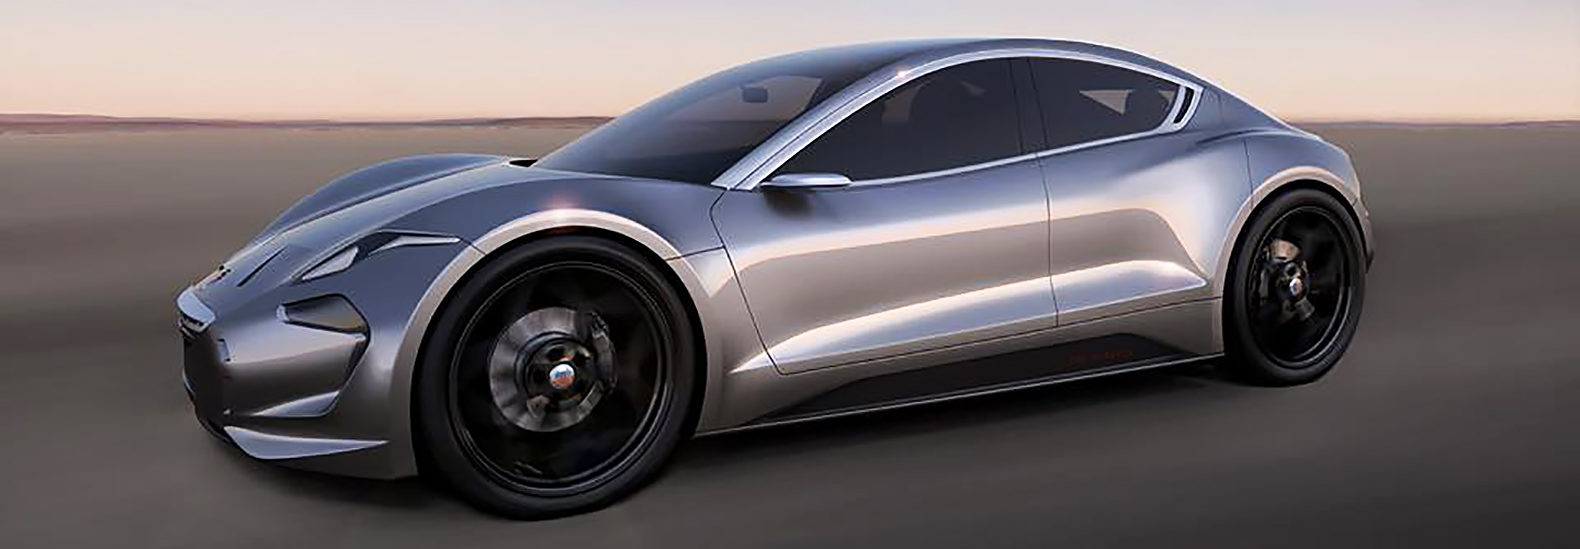 Henrik-Fisker-Tesla5-rival-EV-Emotion-1-1580x549